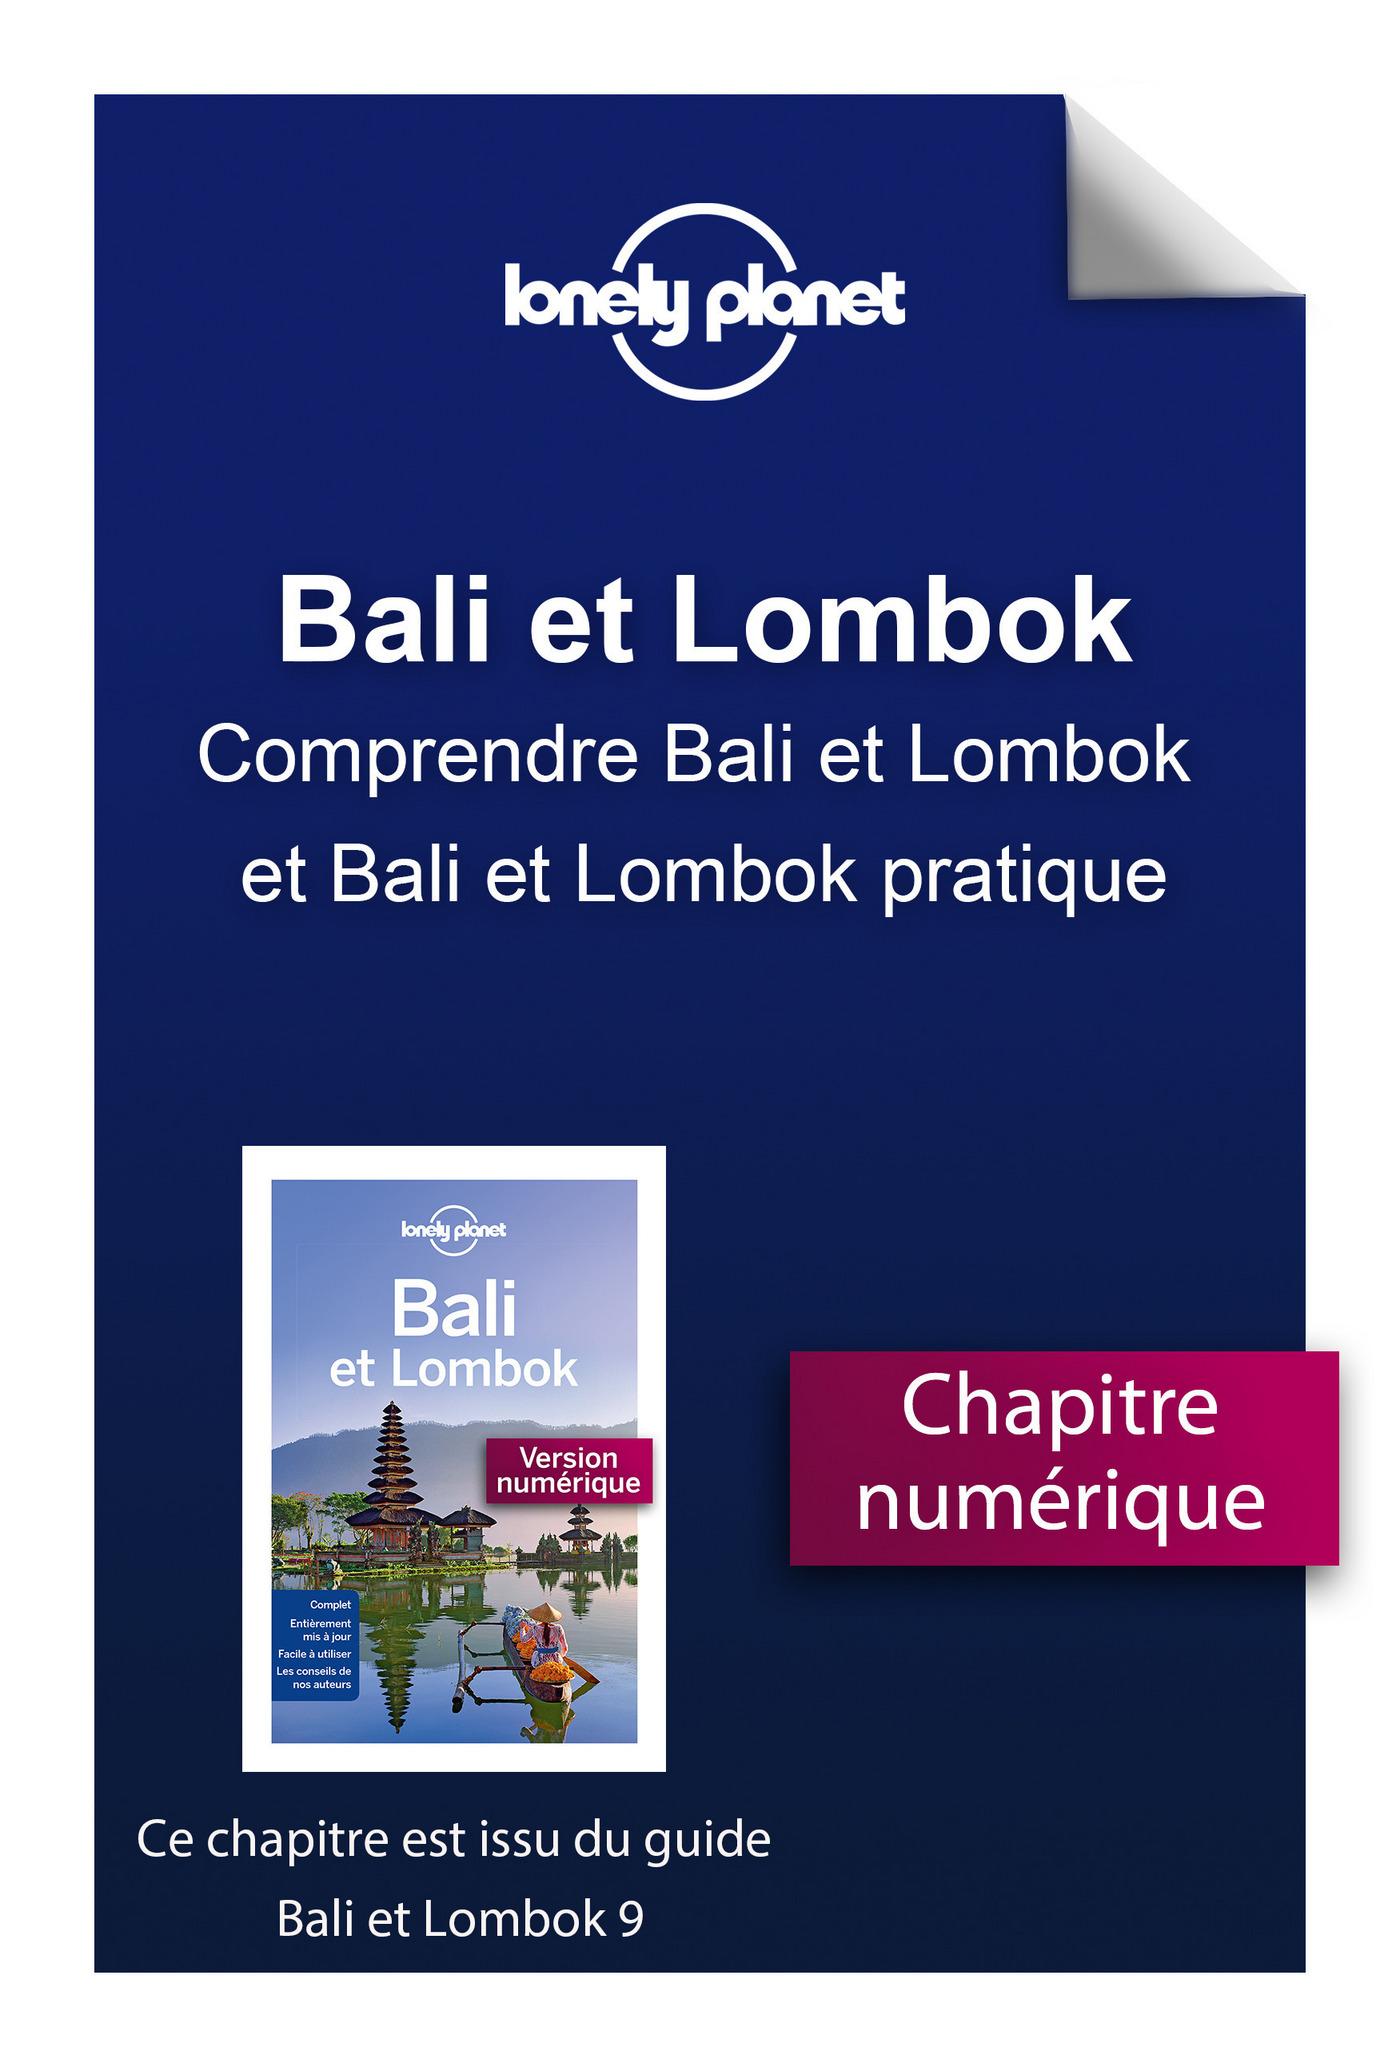 Bali et Lombok 9 - Comprendre Bali et Lombok et Bali et Lombok pratique